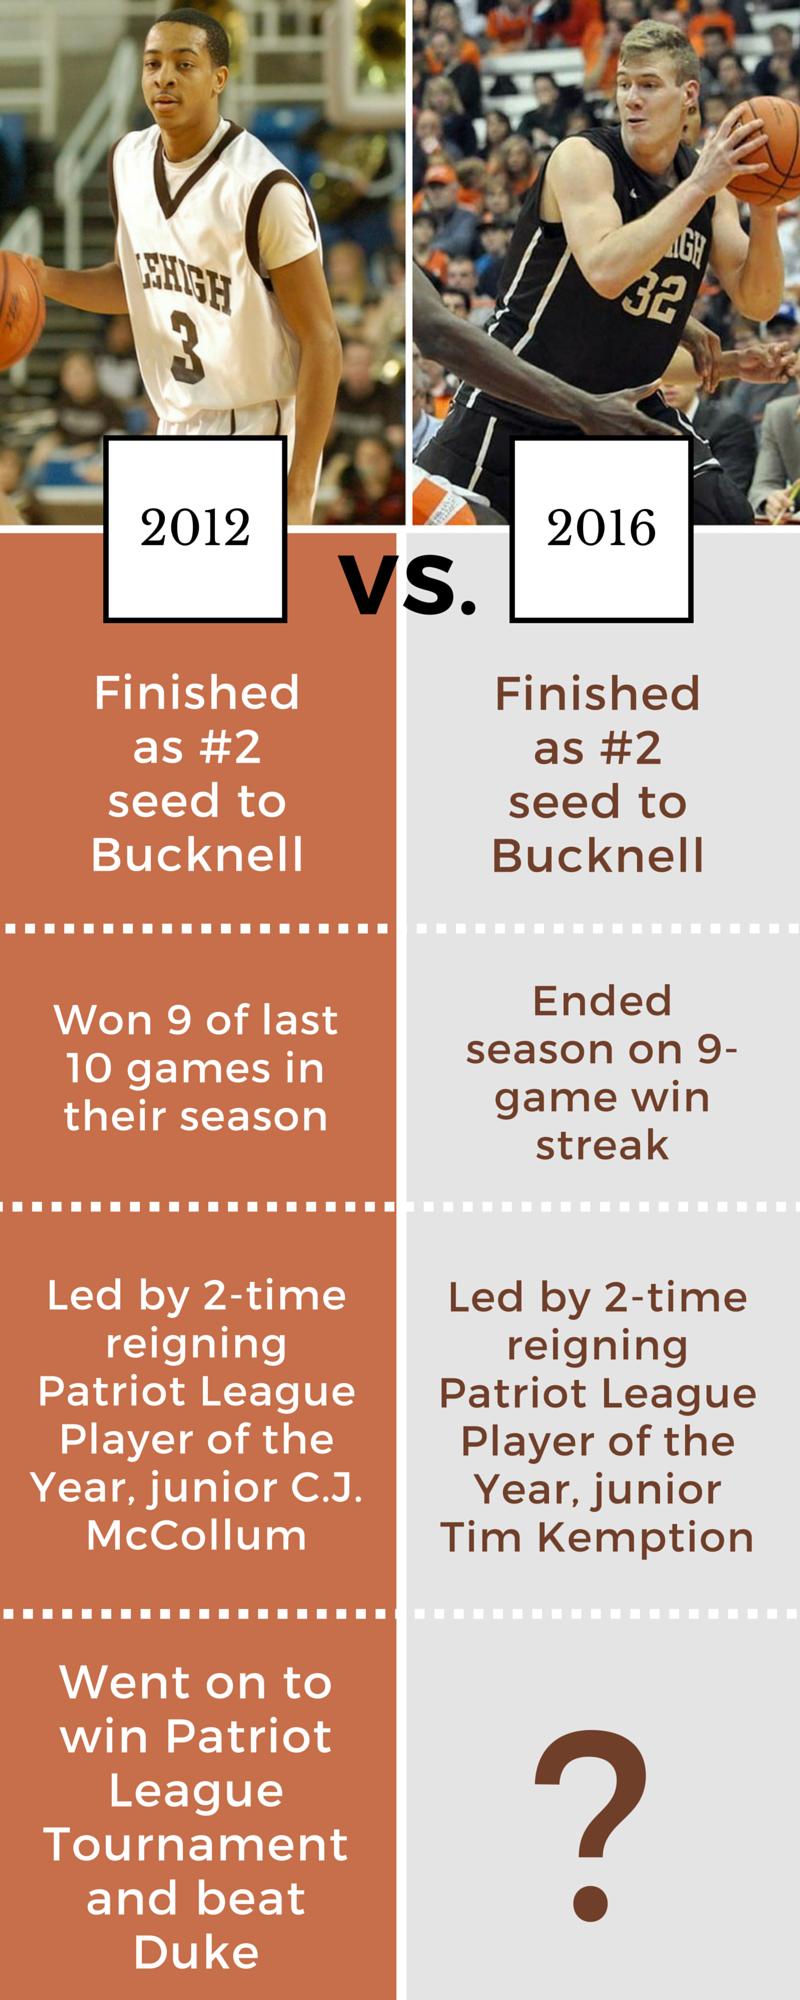 Lehigh 2012 vs 2016